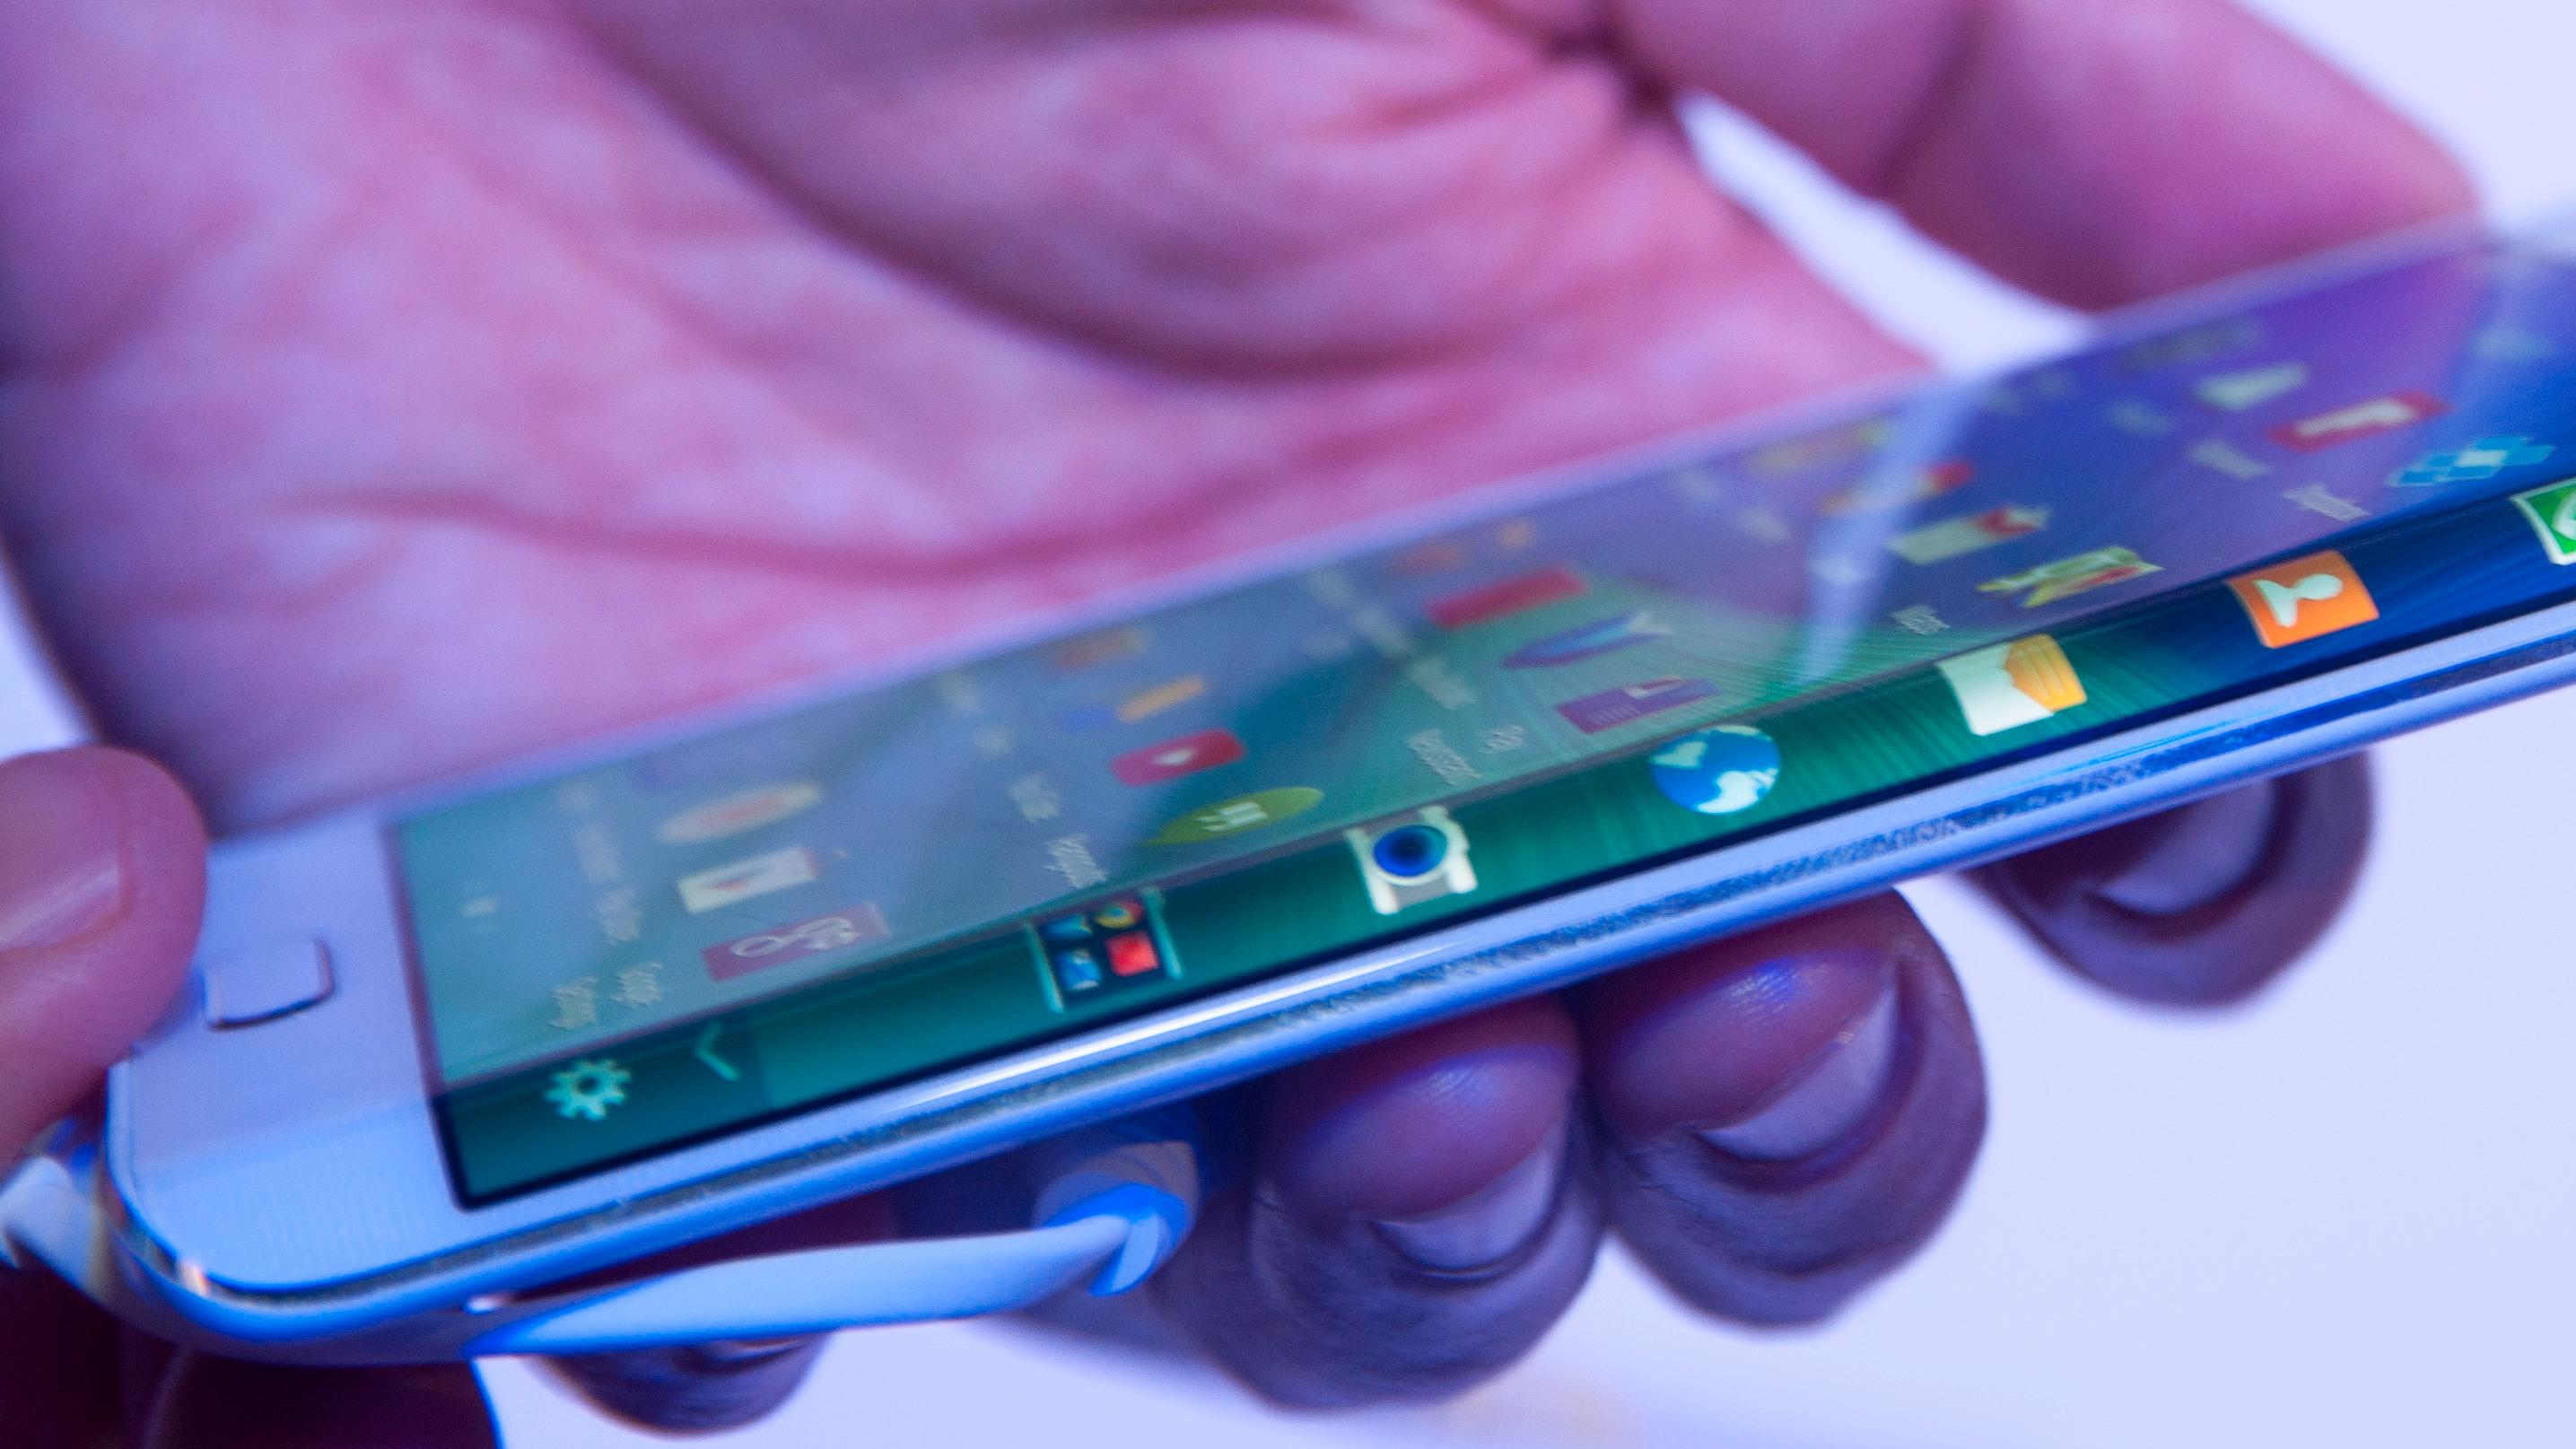 Samsungs kurvede supermobil kommer likevel